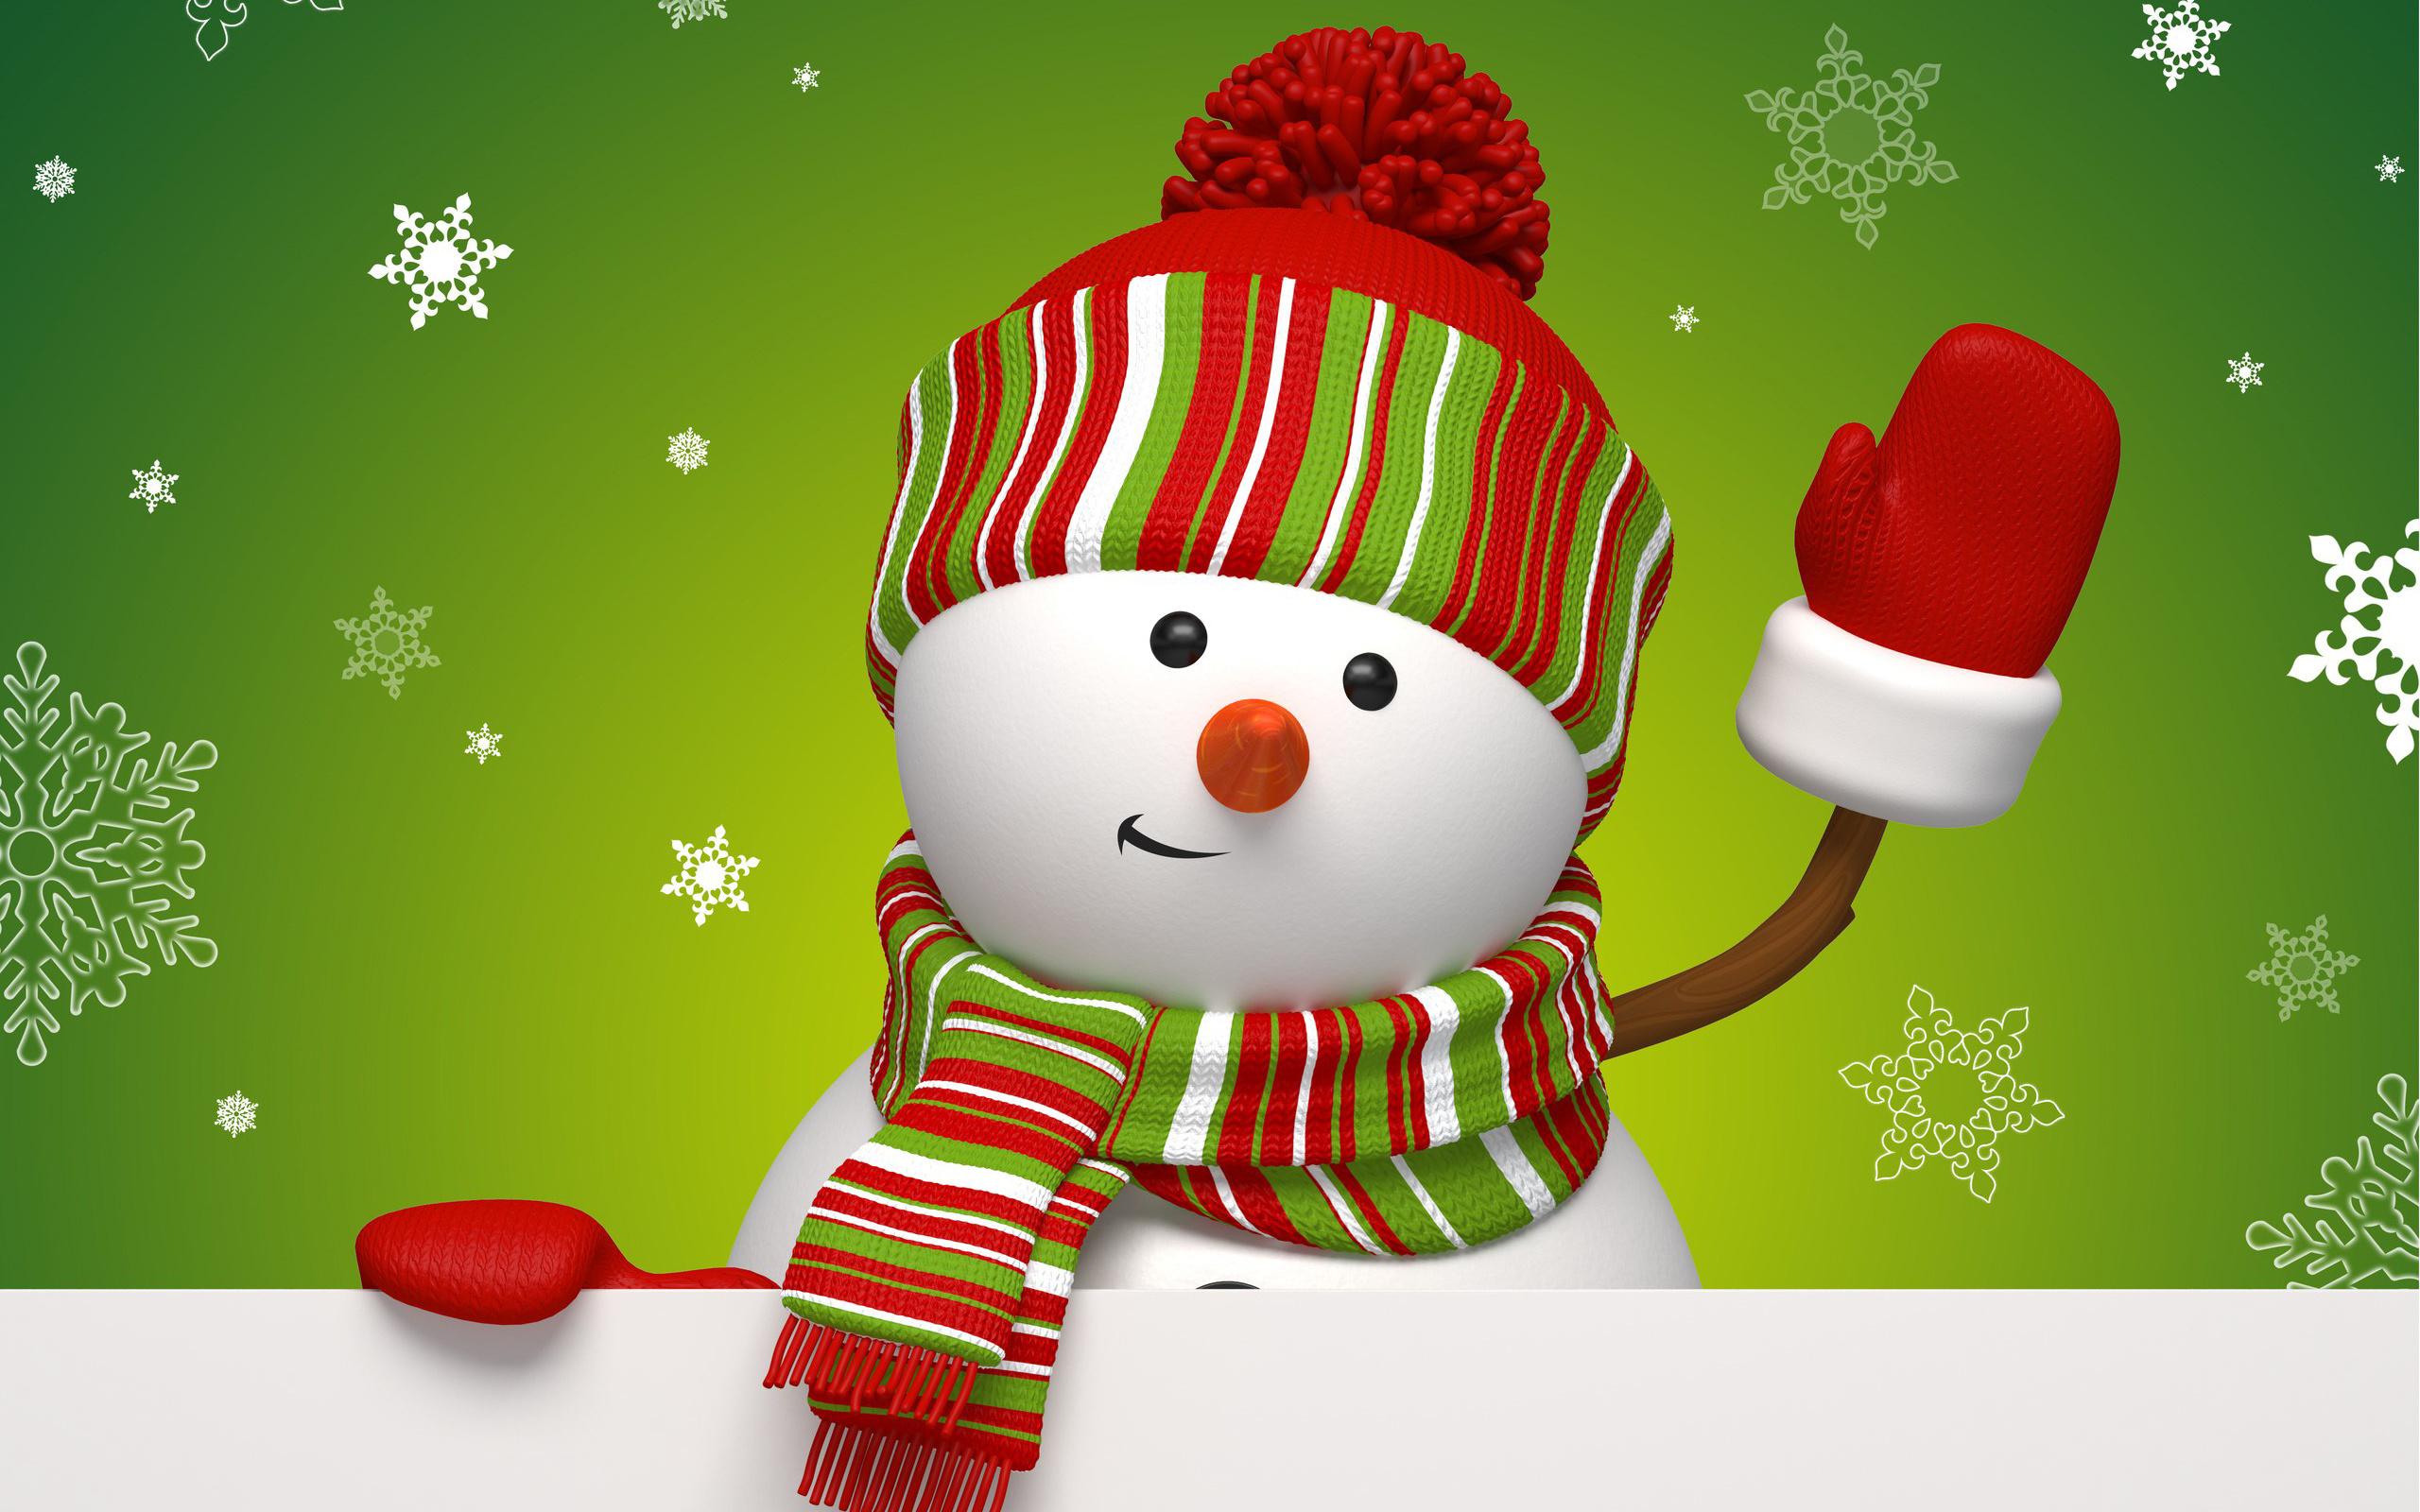 снеговик, празник, снежинки